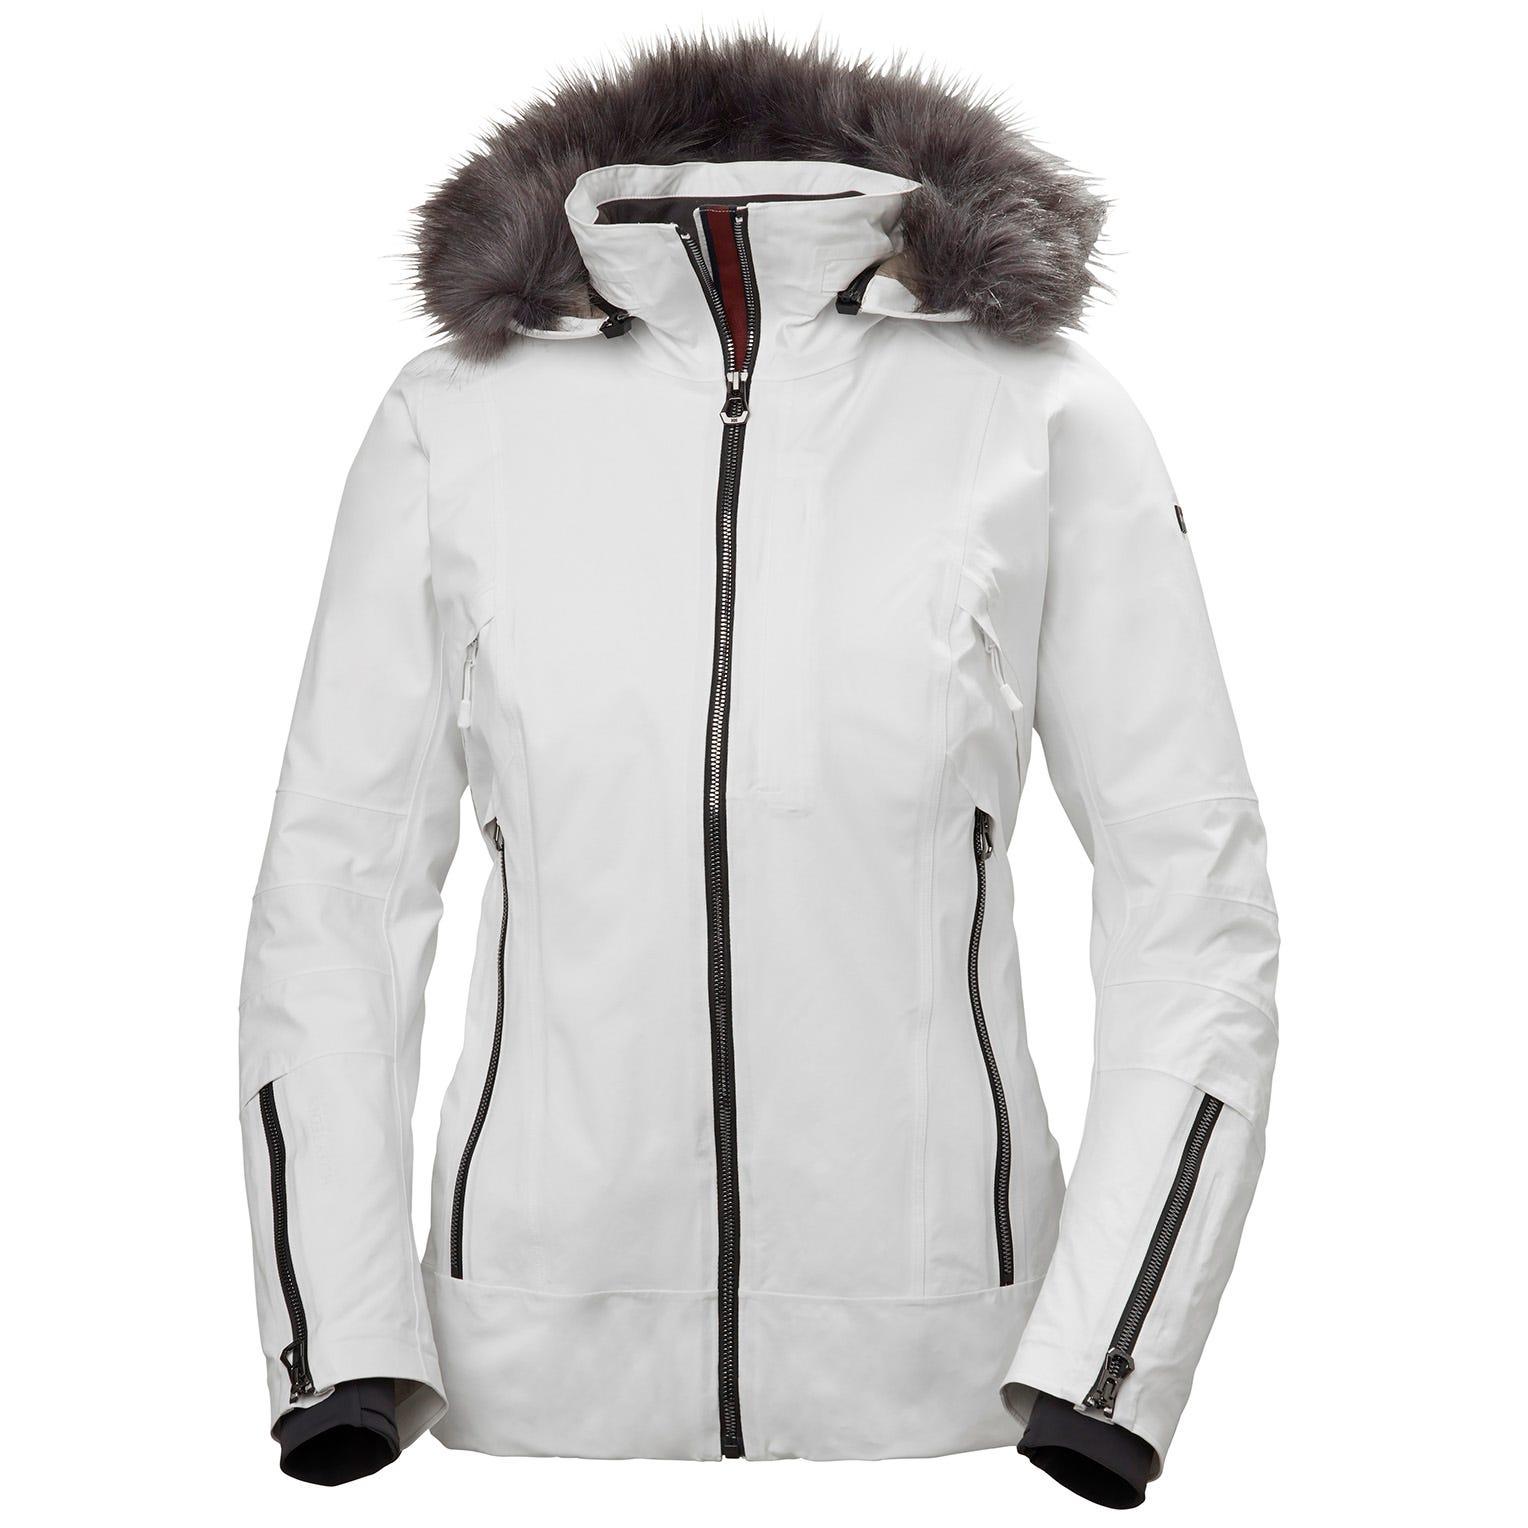 Helly Hansen Womens Snowdancer Ski Jacket With Faux Fur Hood White XL